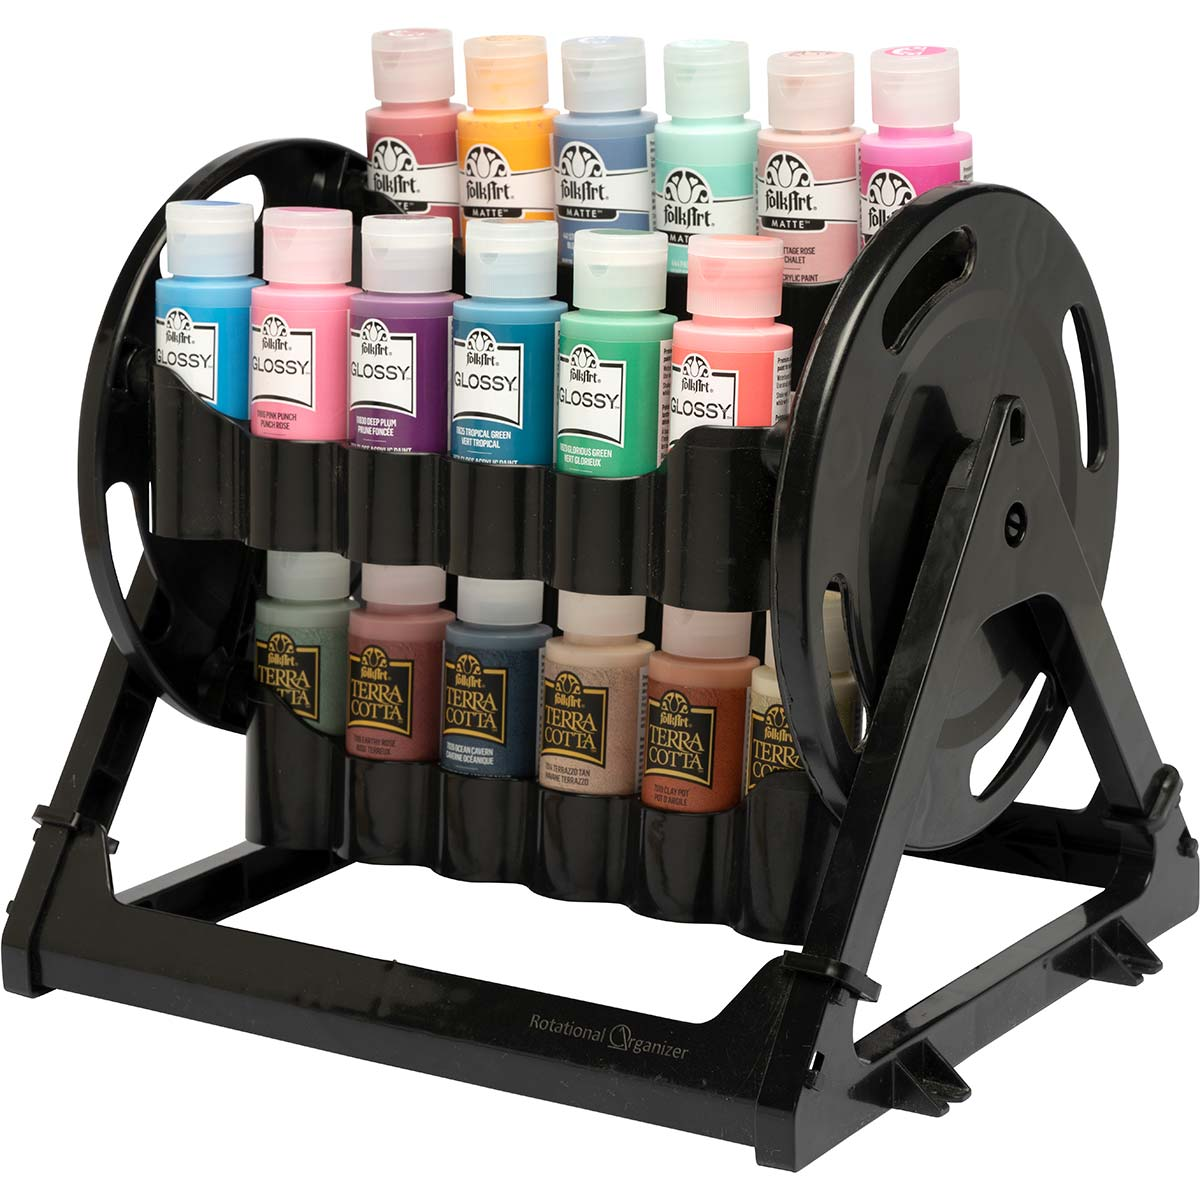 Plaid ® Rotational Organizer Paint Supply Storage Caddy- 31100